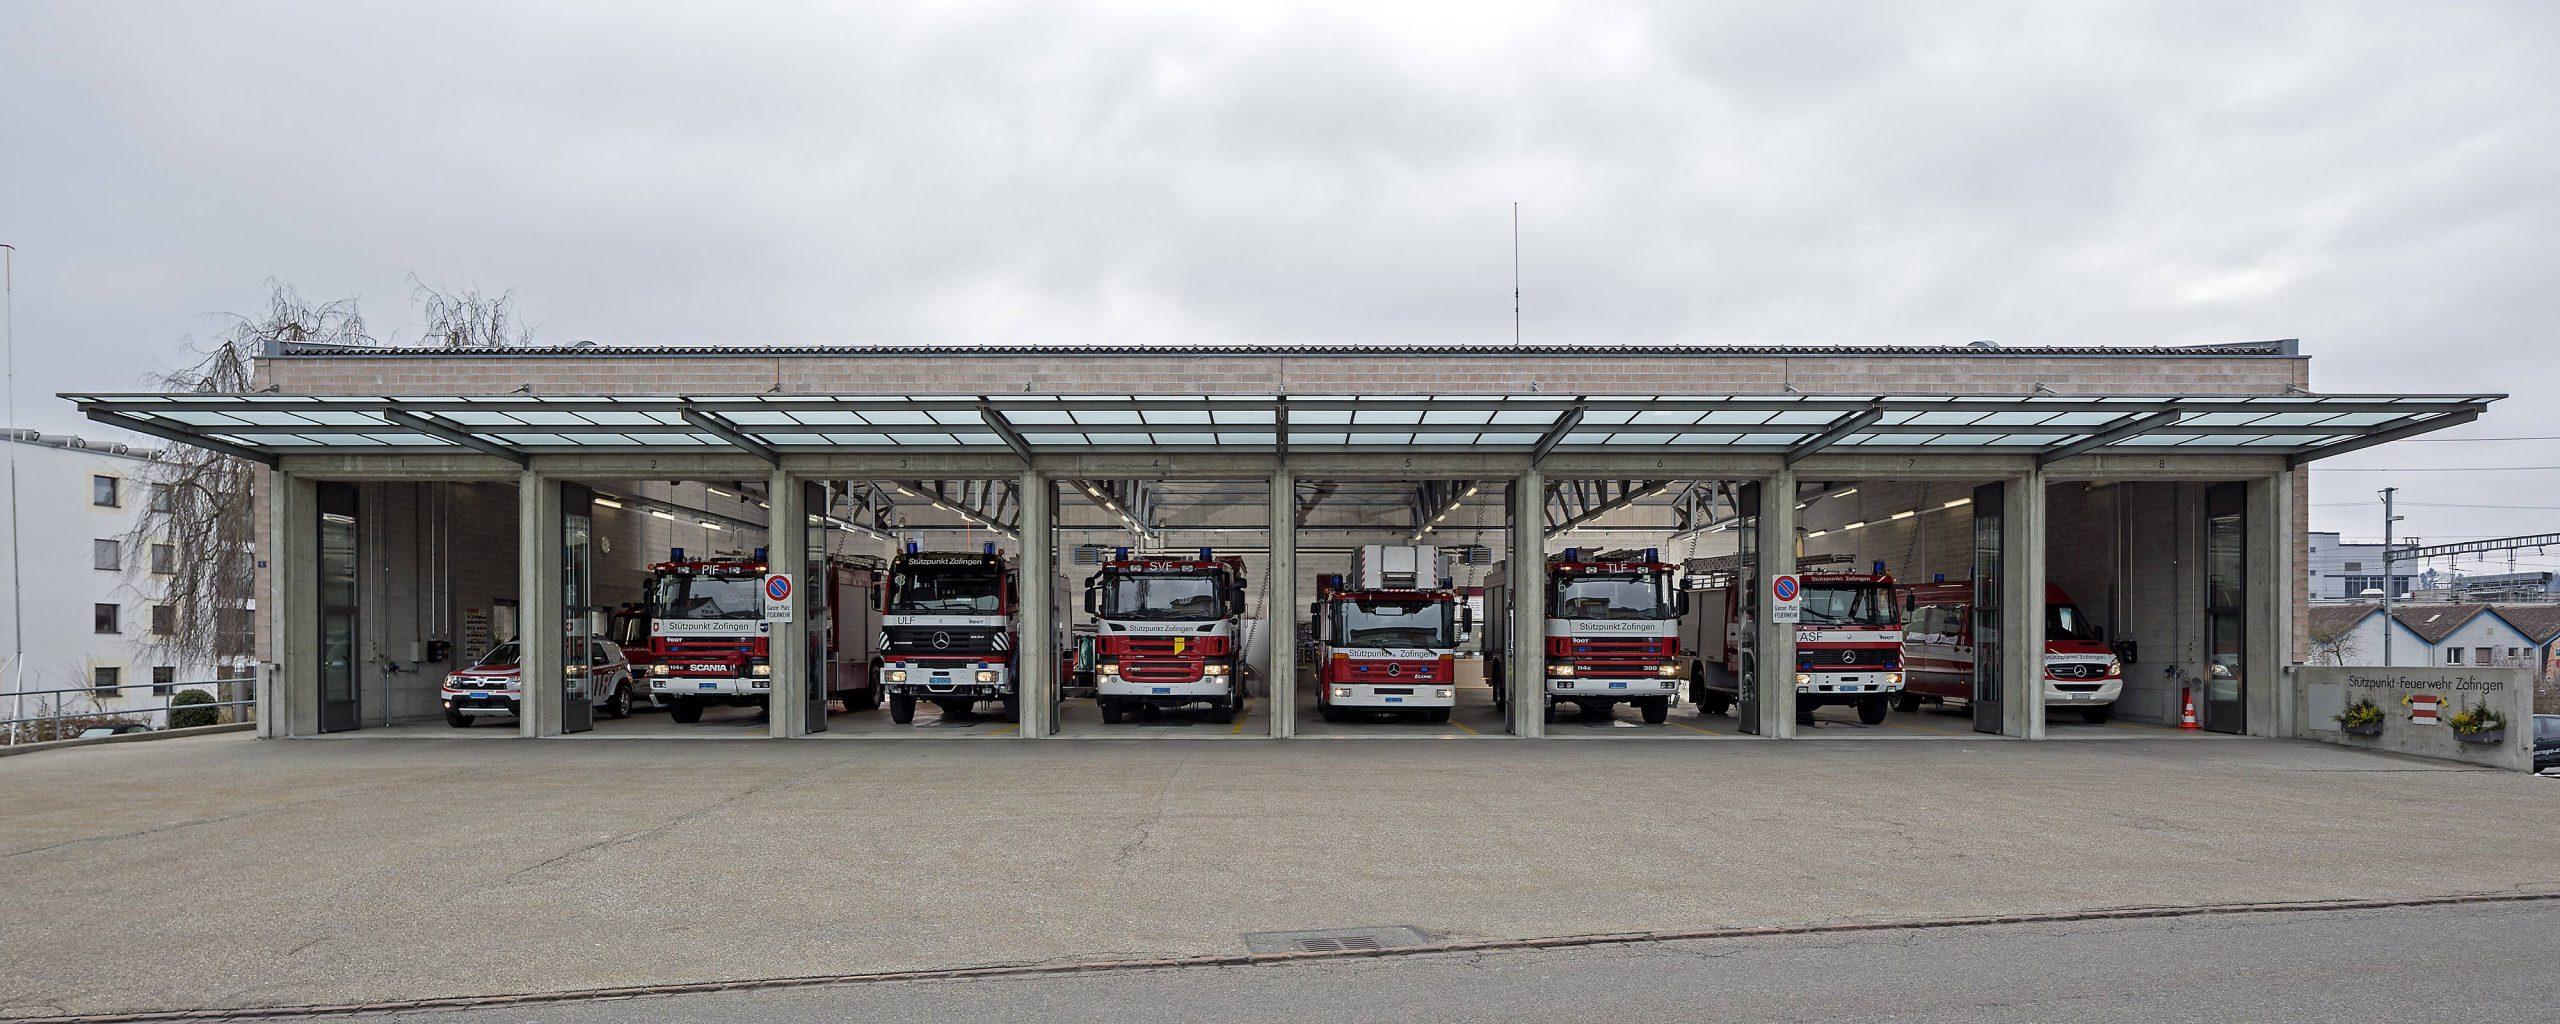 8801 Feuerwehrmagazin Funken